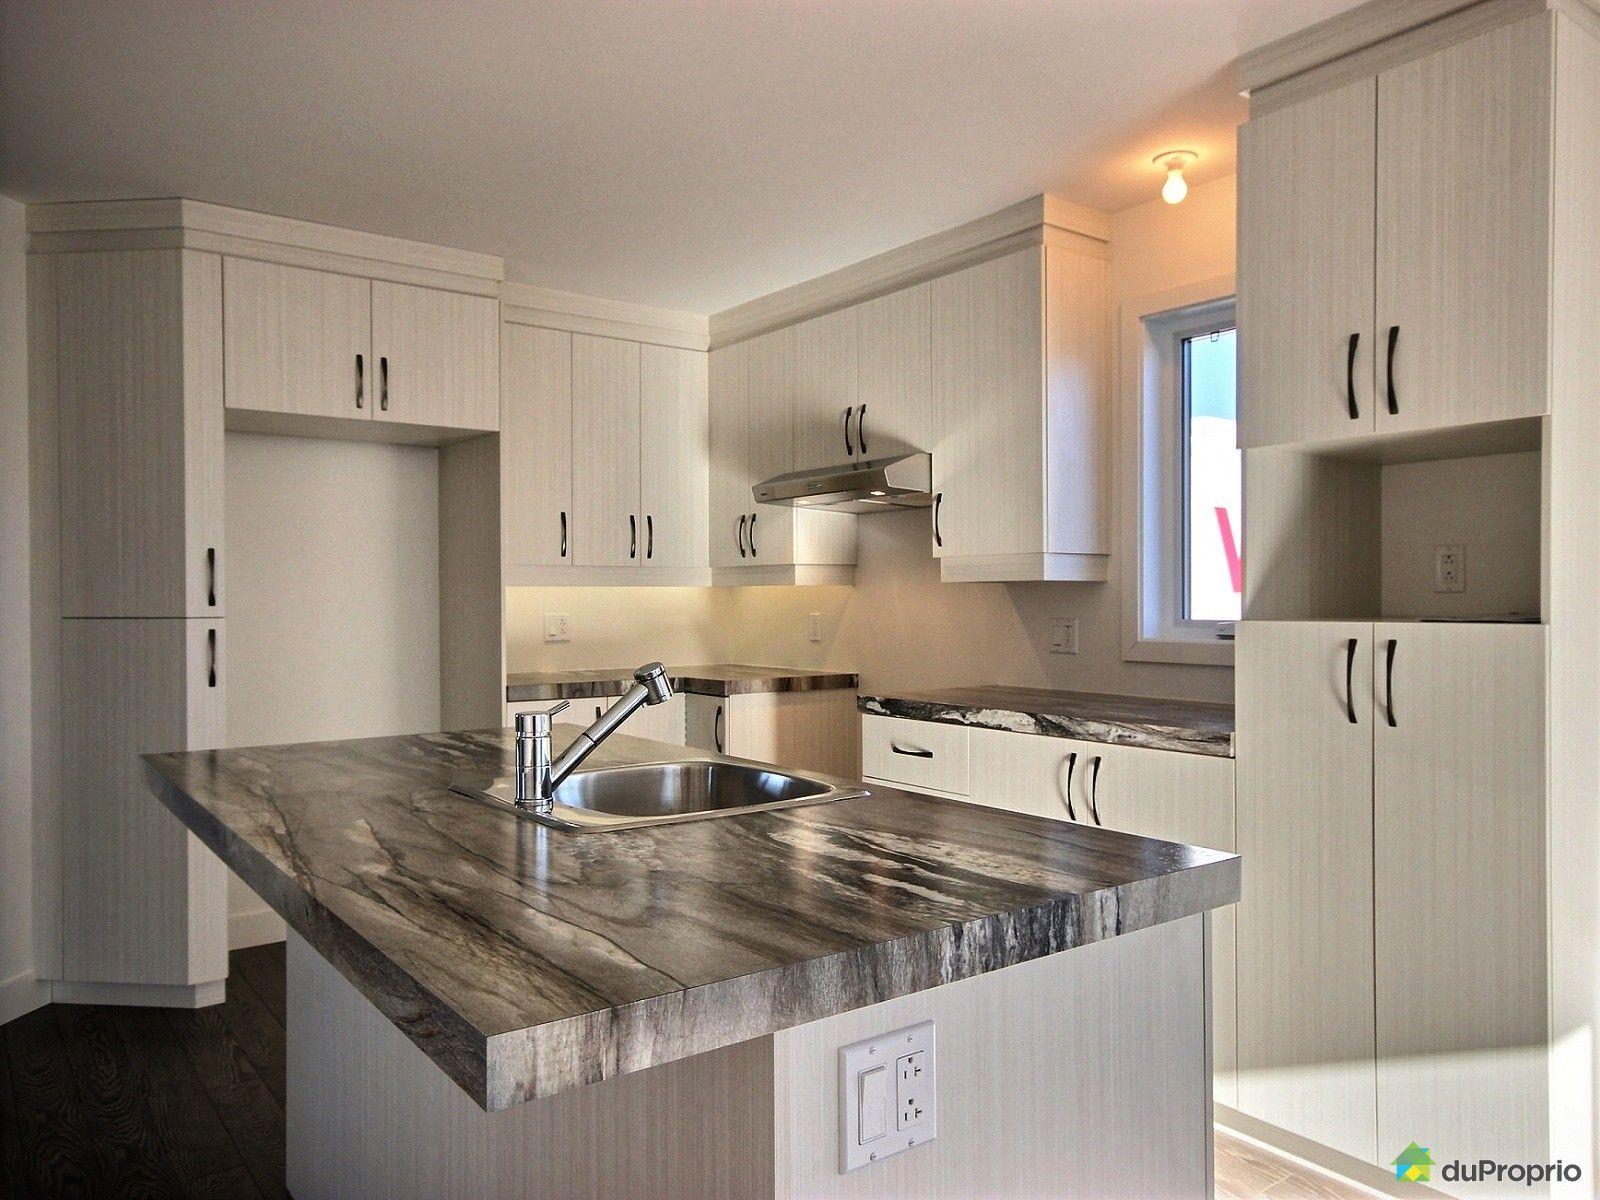 maison neuve vendu victoriaville immobilier qu bec duproprio 581225. Black Bedroom Furniture Sets. Home Design Ideas